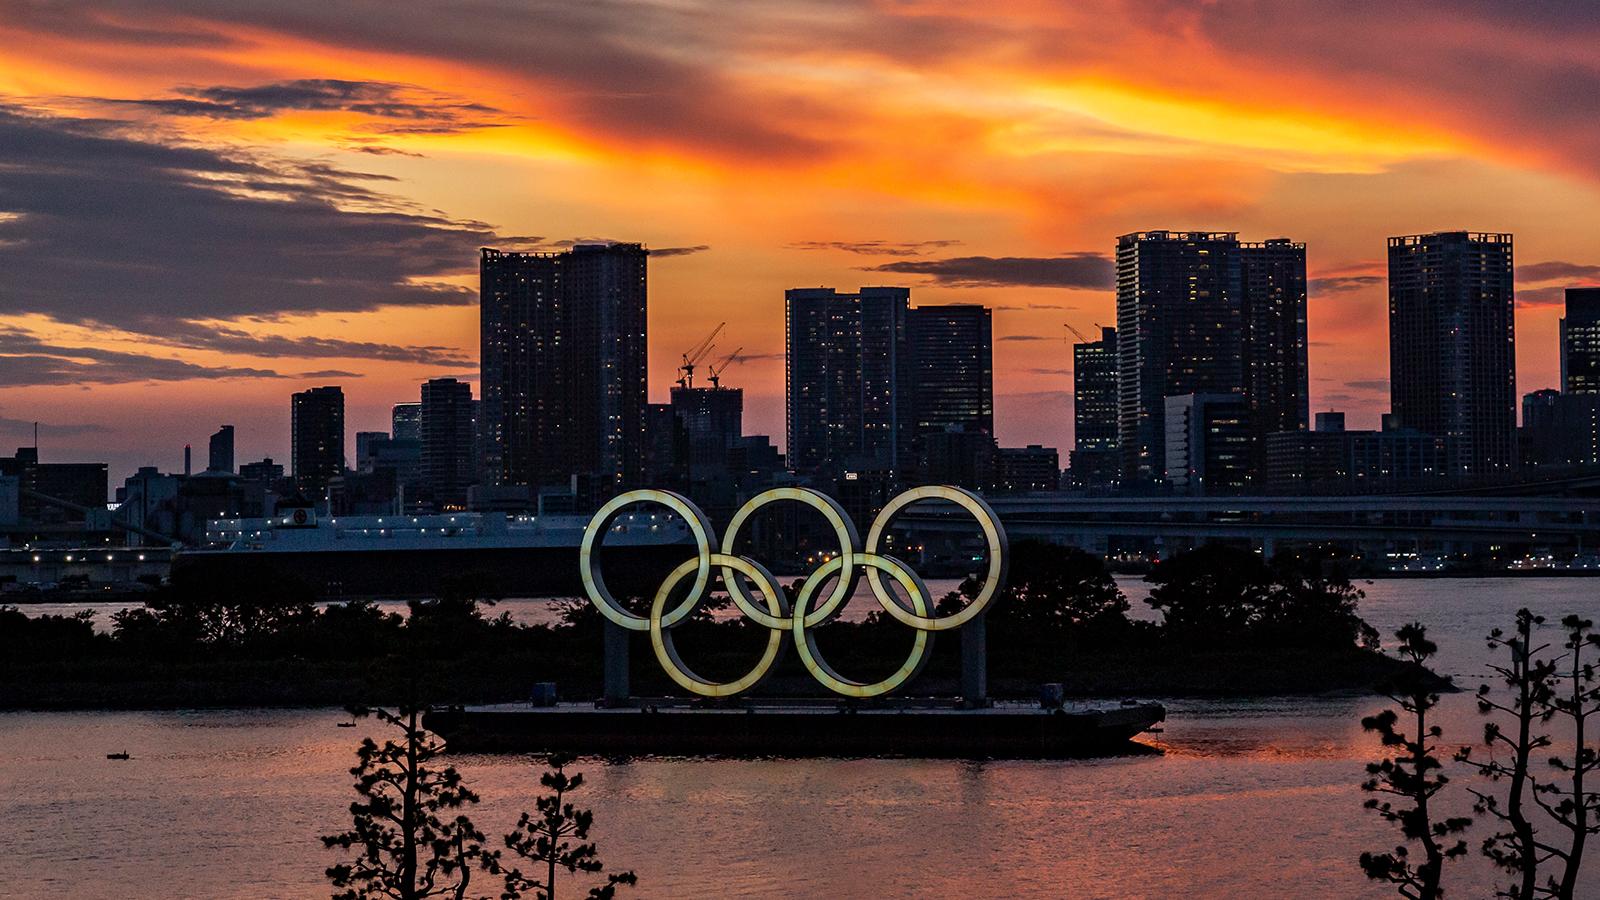 Juegos Olímpicos Tokio 2020 (2021): minuto a minuto